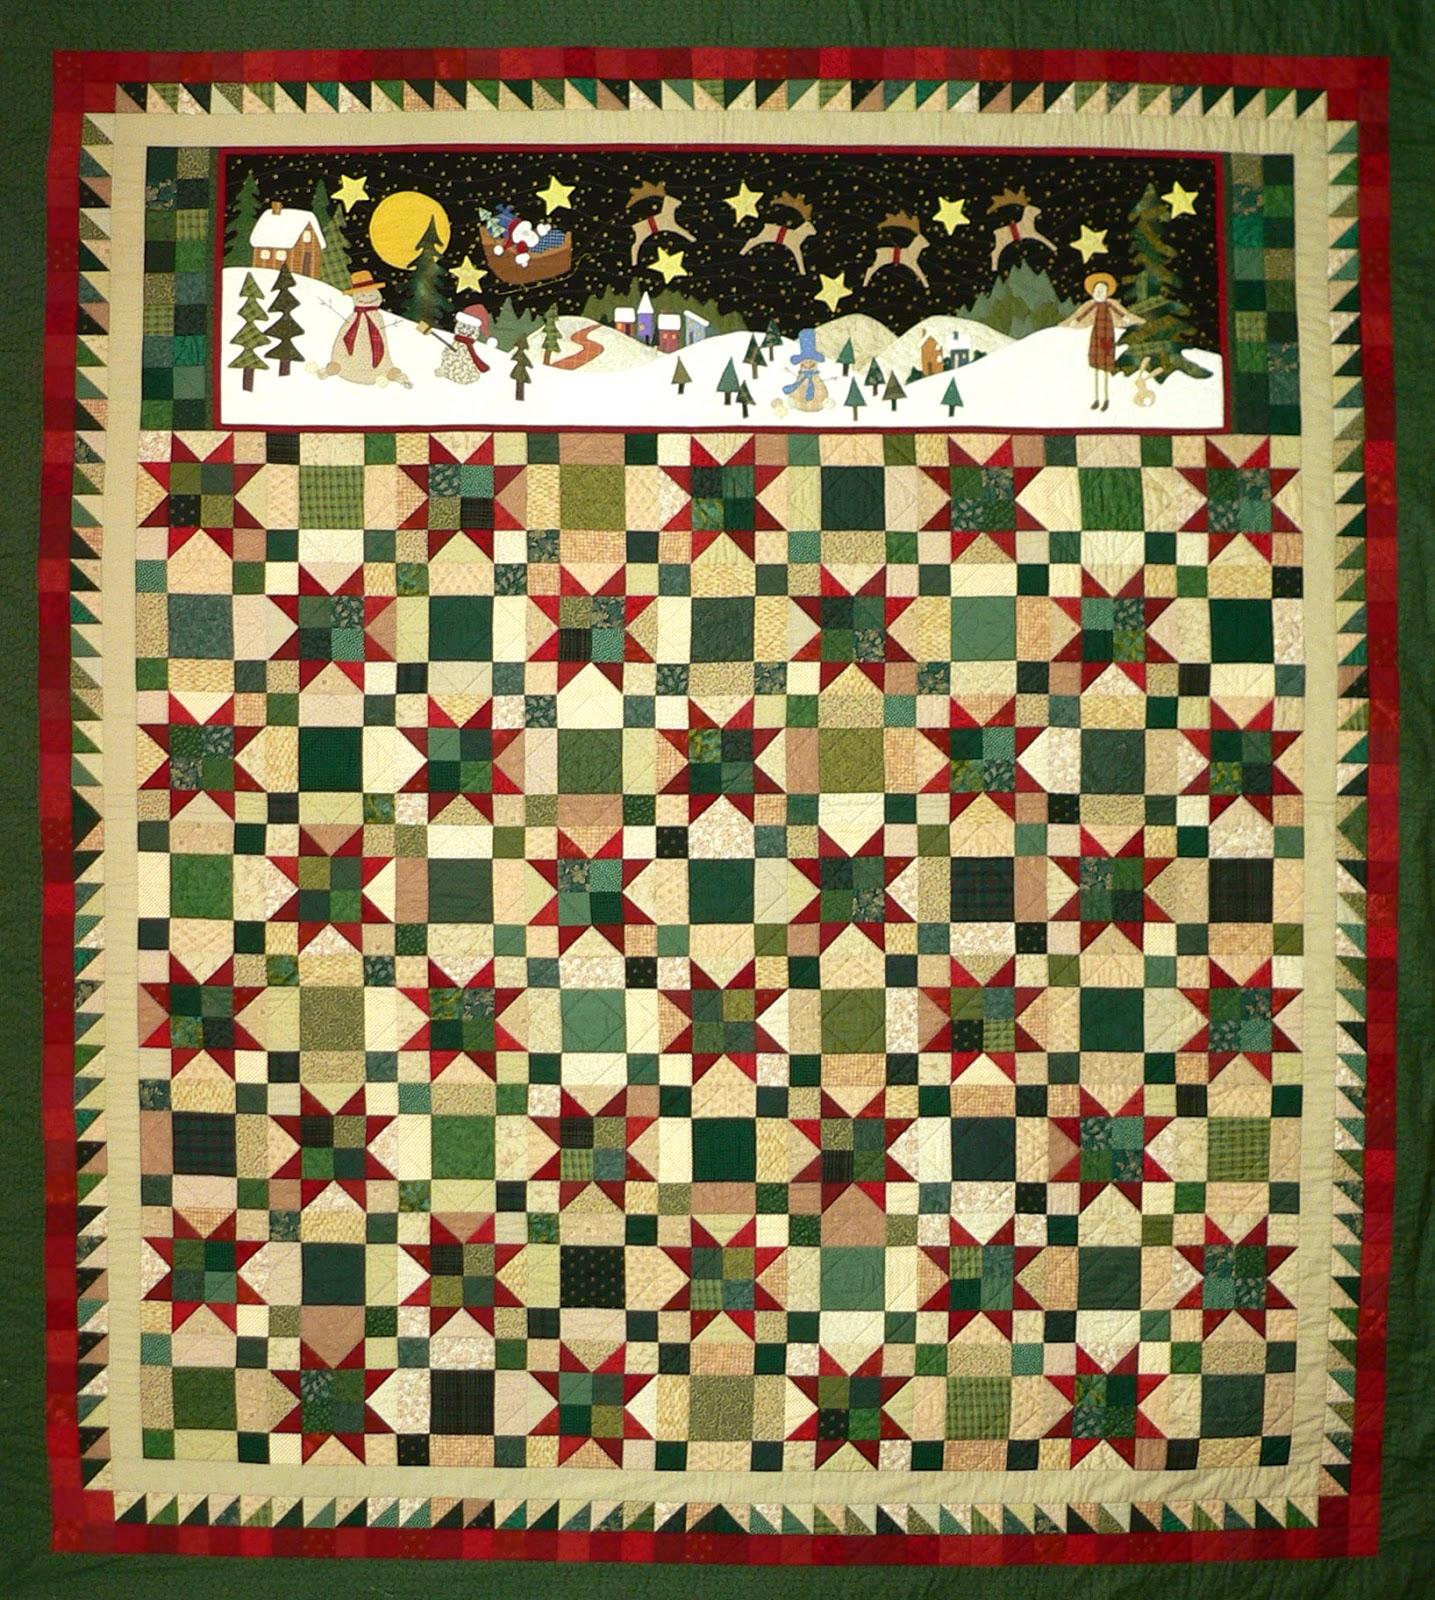 Come Quilt (Sue Garman): Quilts Galore! : sue garman quilt patterns - Adamdwight.com